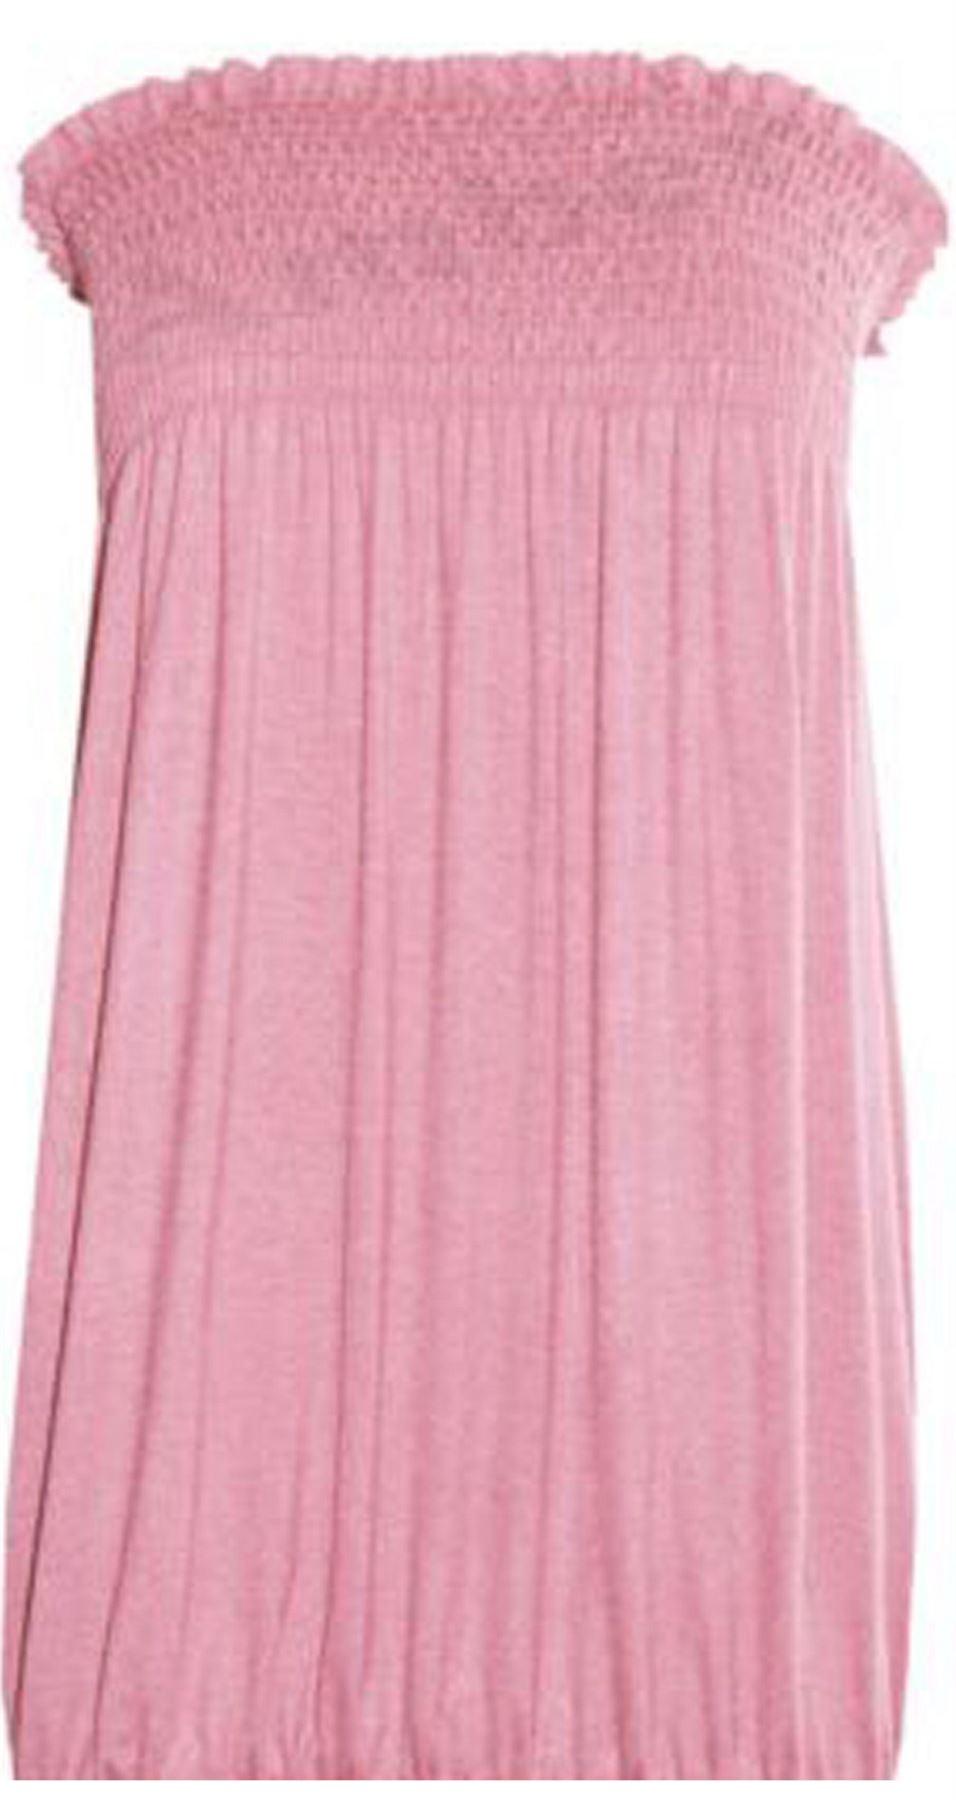 New-Ladies-Bandeau-Boob-Gathering-Tops-Boob-Tube-Beach-Wear-Tunics-8-26 thumbnail 10